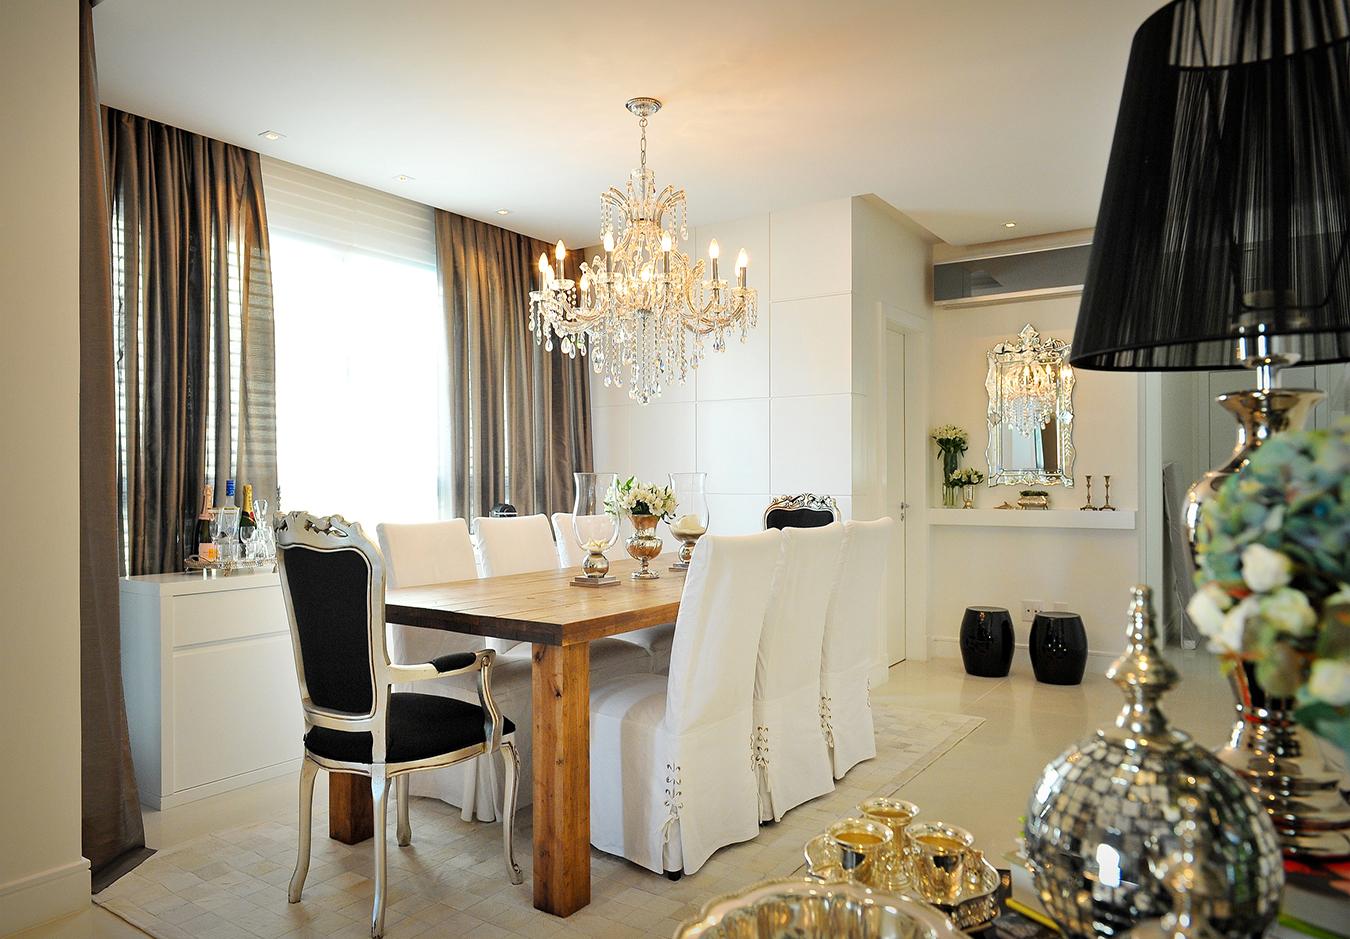 Luminarias Modernas Para Sala De Jantar Dicas De Projetos De  -> Lustres Para Sala De Teto Alto